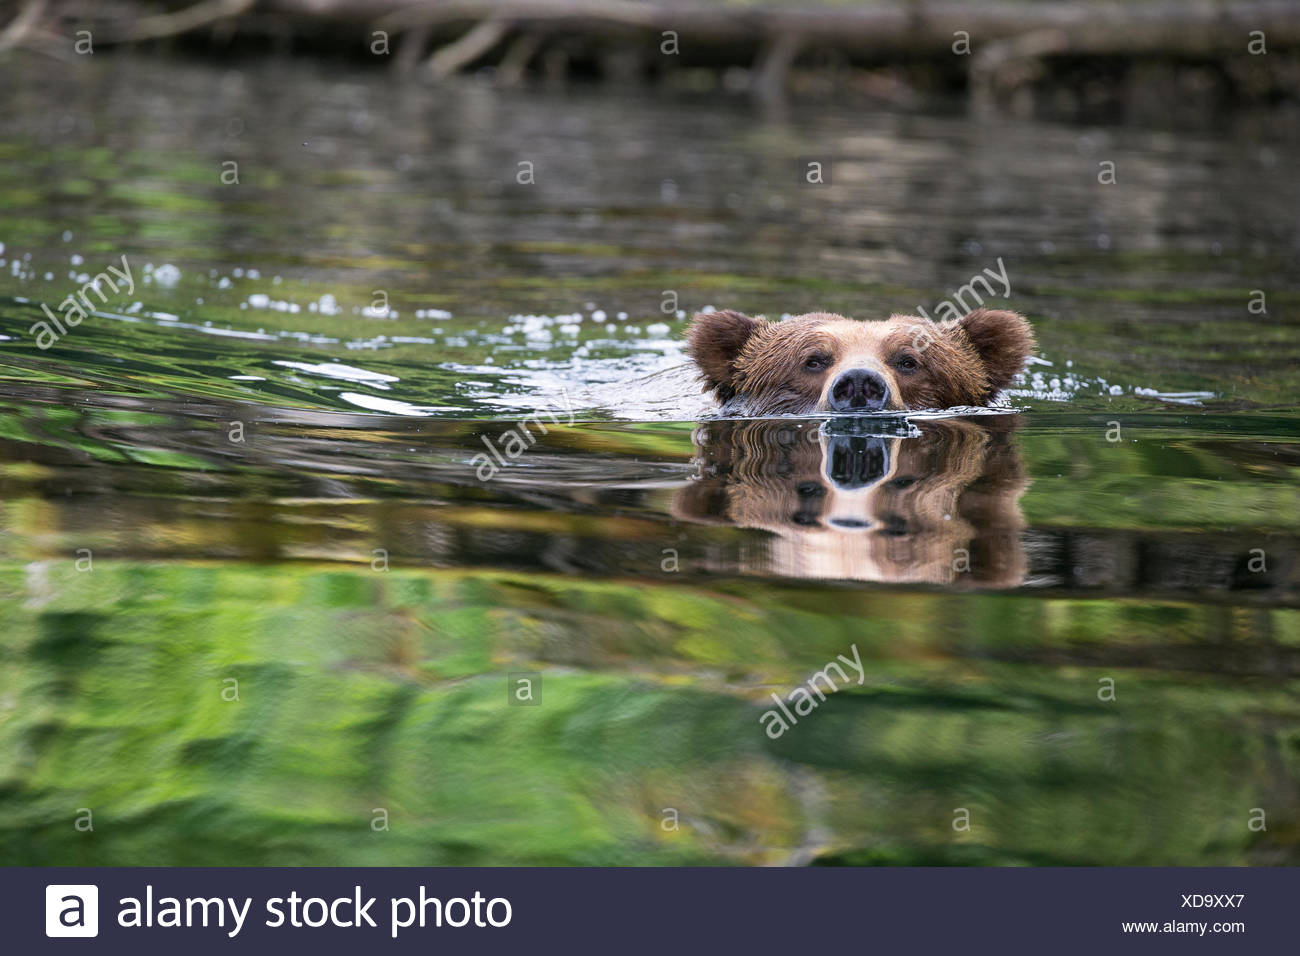 Grizzly bear (Ursus arctos horribilis), large male, swimming, Khutzeymateen Grizzly Bear Sanctuary, British Columbia, Canada. - Stock Image